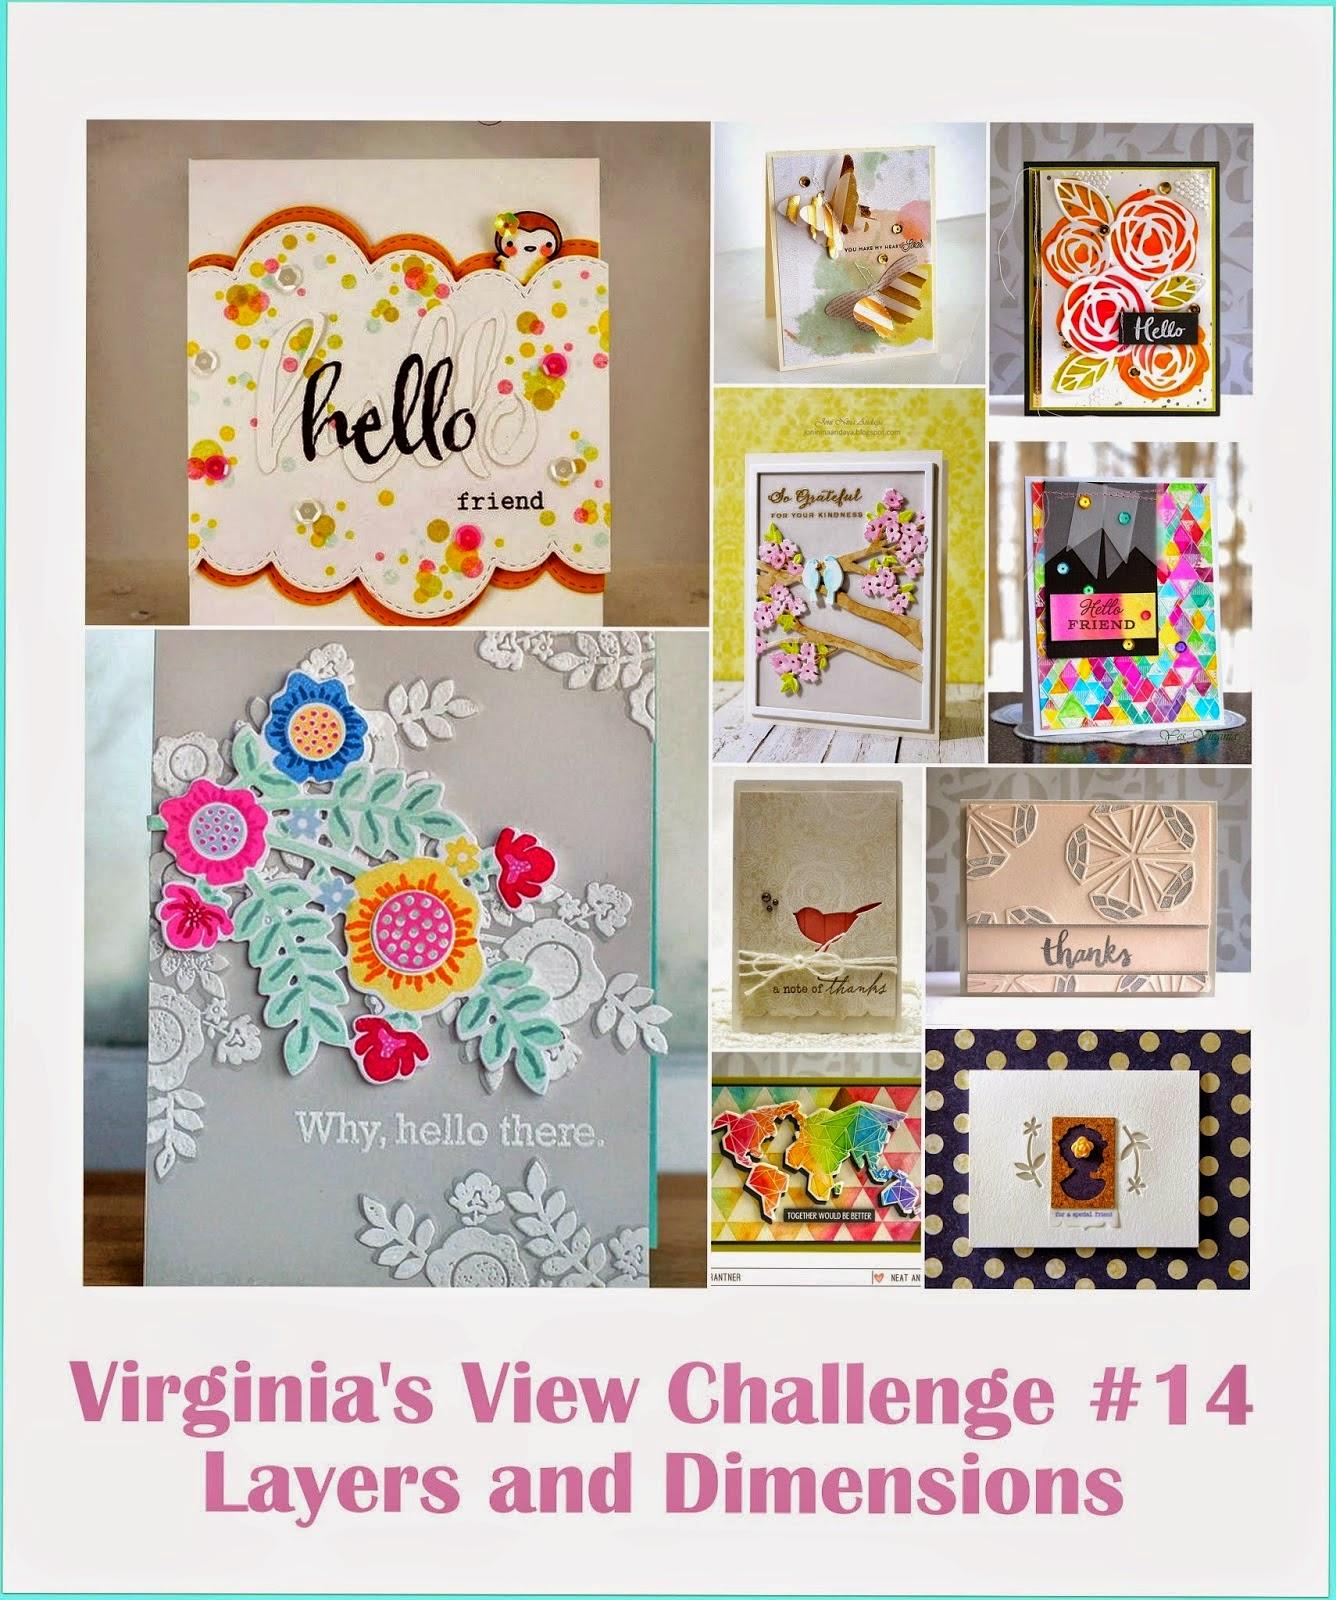 http://virginiasviewchallenge.blogspot.com.au/2015/04/virginias-view-challenge-14.html